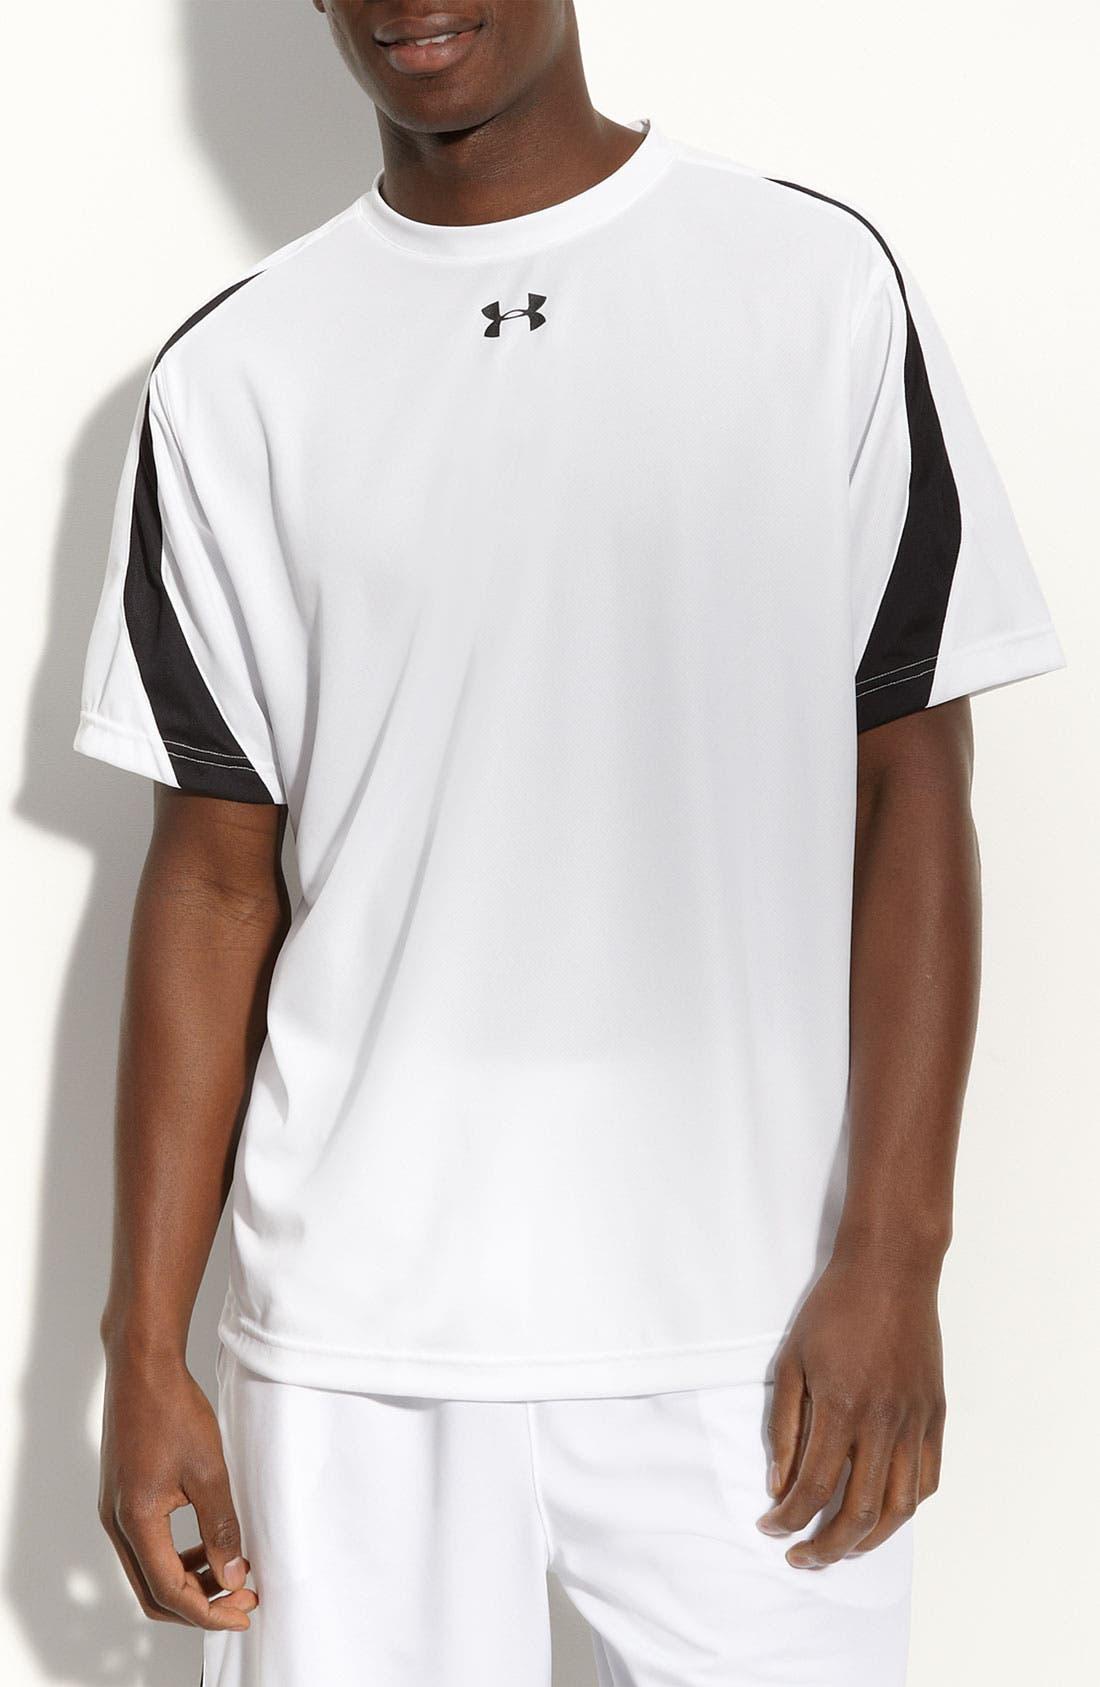 Alternate Image 1 Selected - Under Armour 'Zone III' HeatGear® T-Shirt